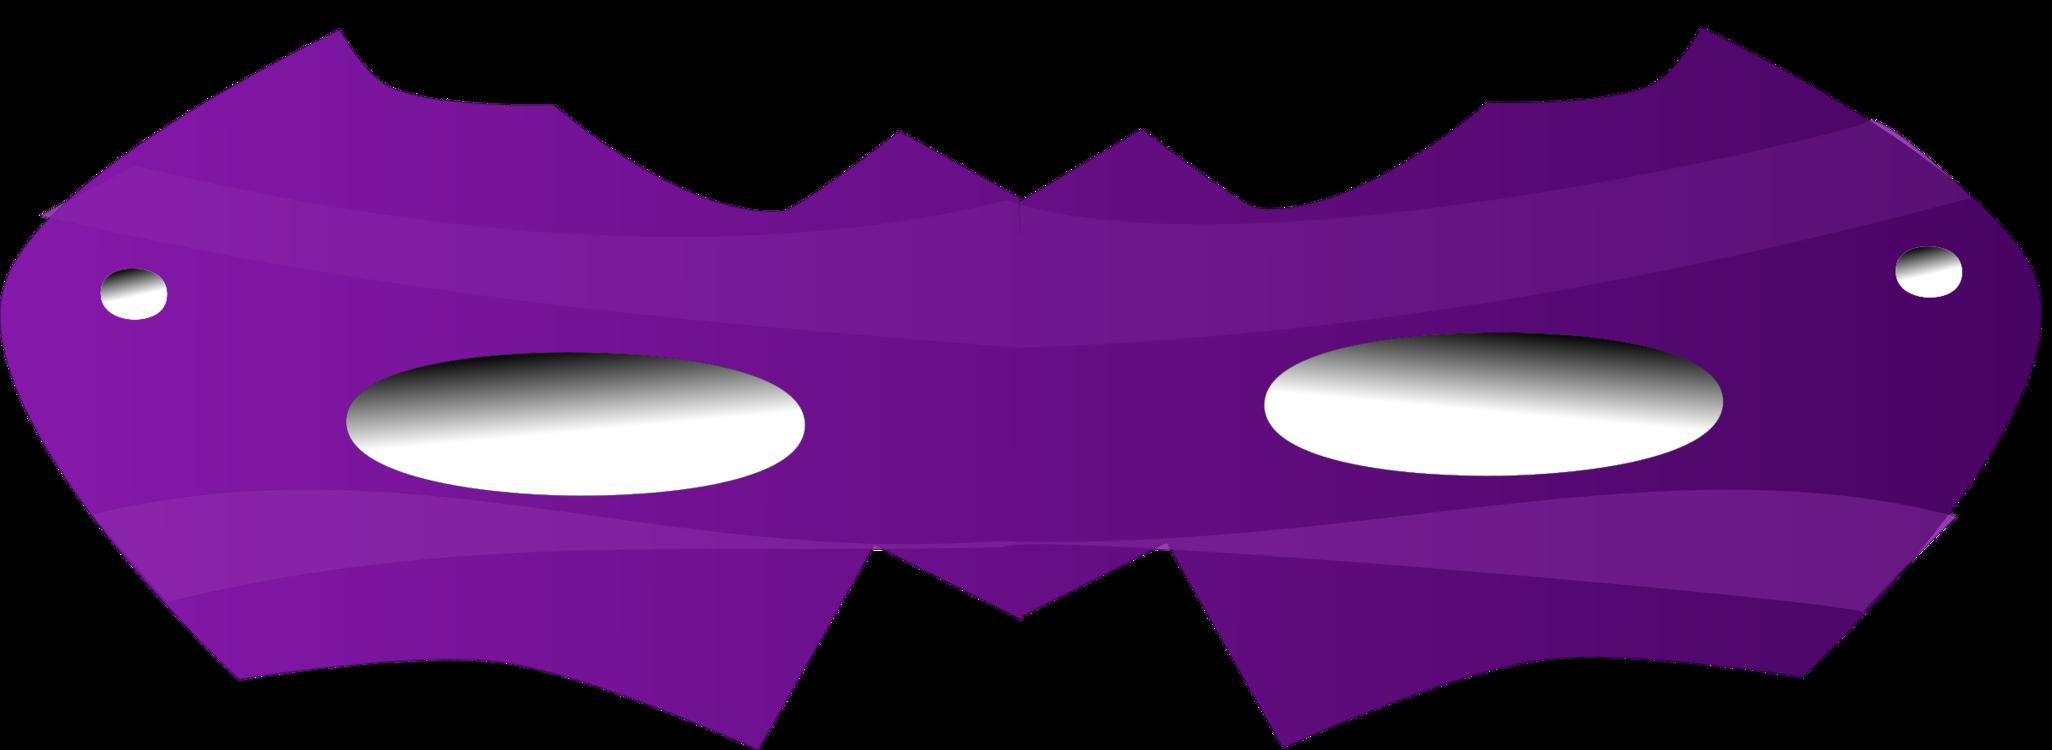 Pink,Angle,Purple